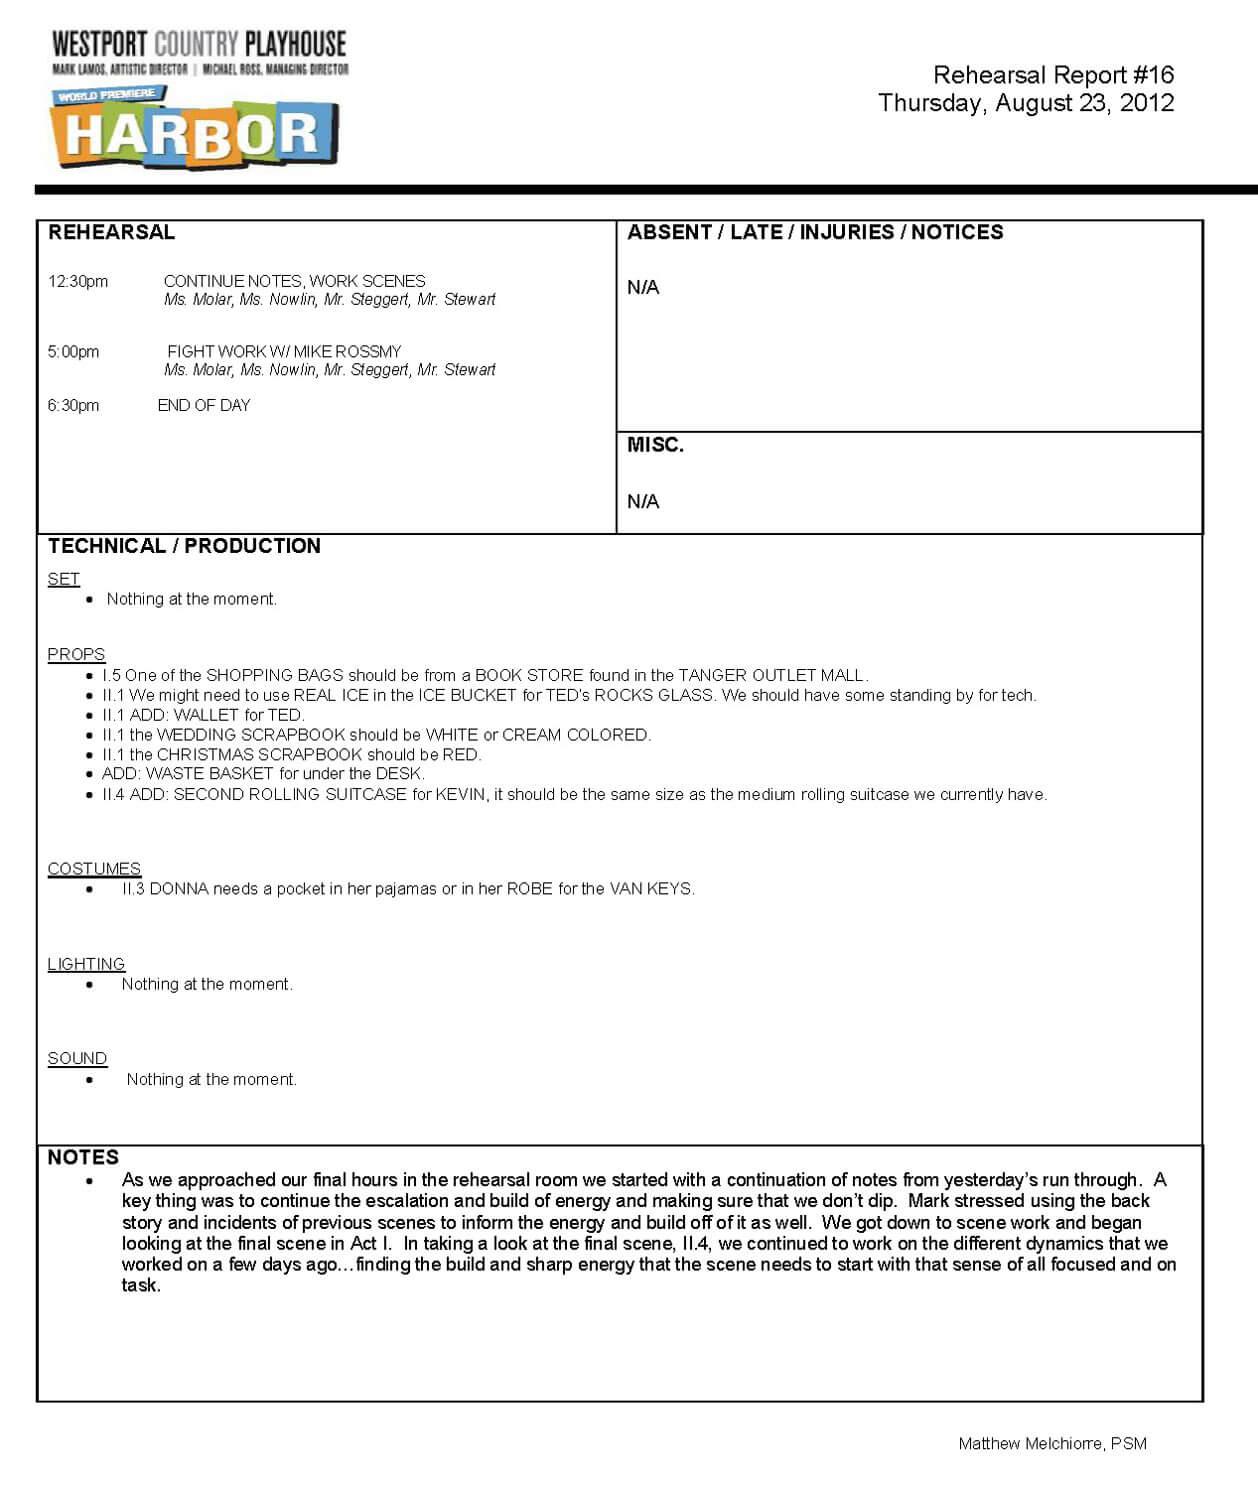 Rehearsal Report Template ] - Drama Report Theatre Templates Pertaining To Rehearsal Report Template